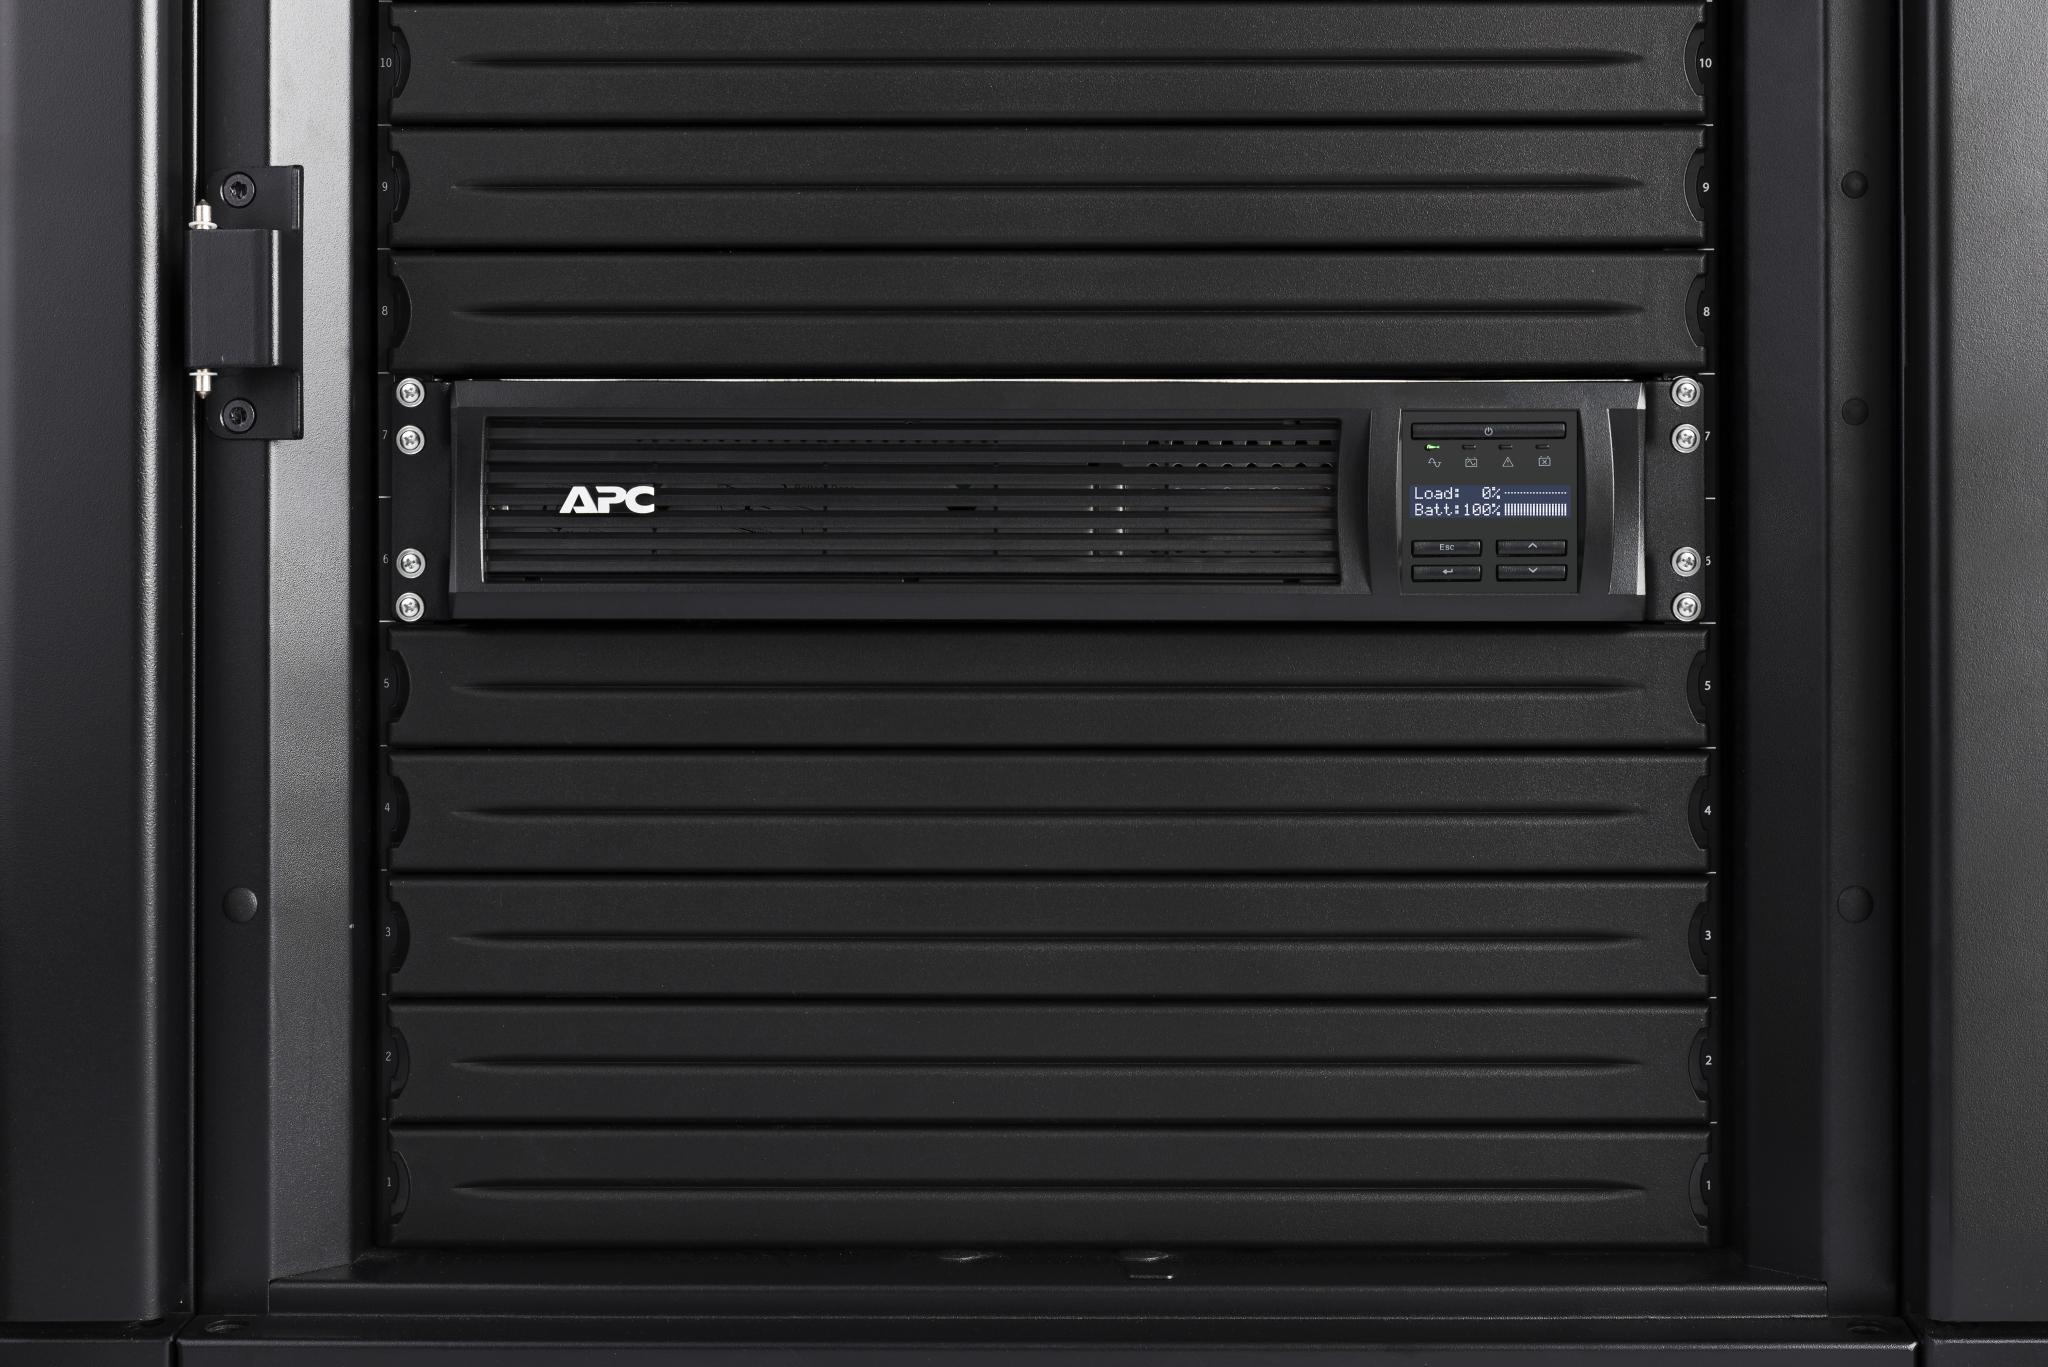 APC SMT1500RMI2UC uninterruptible power supply (UPS)